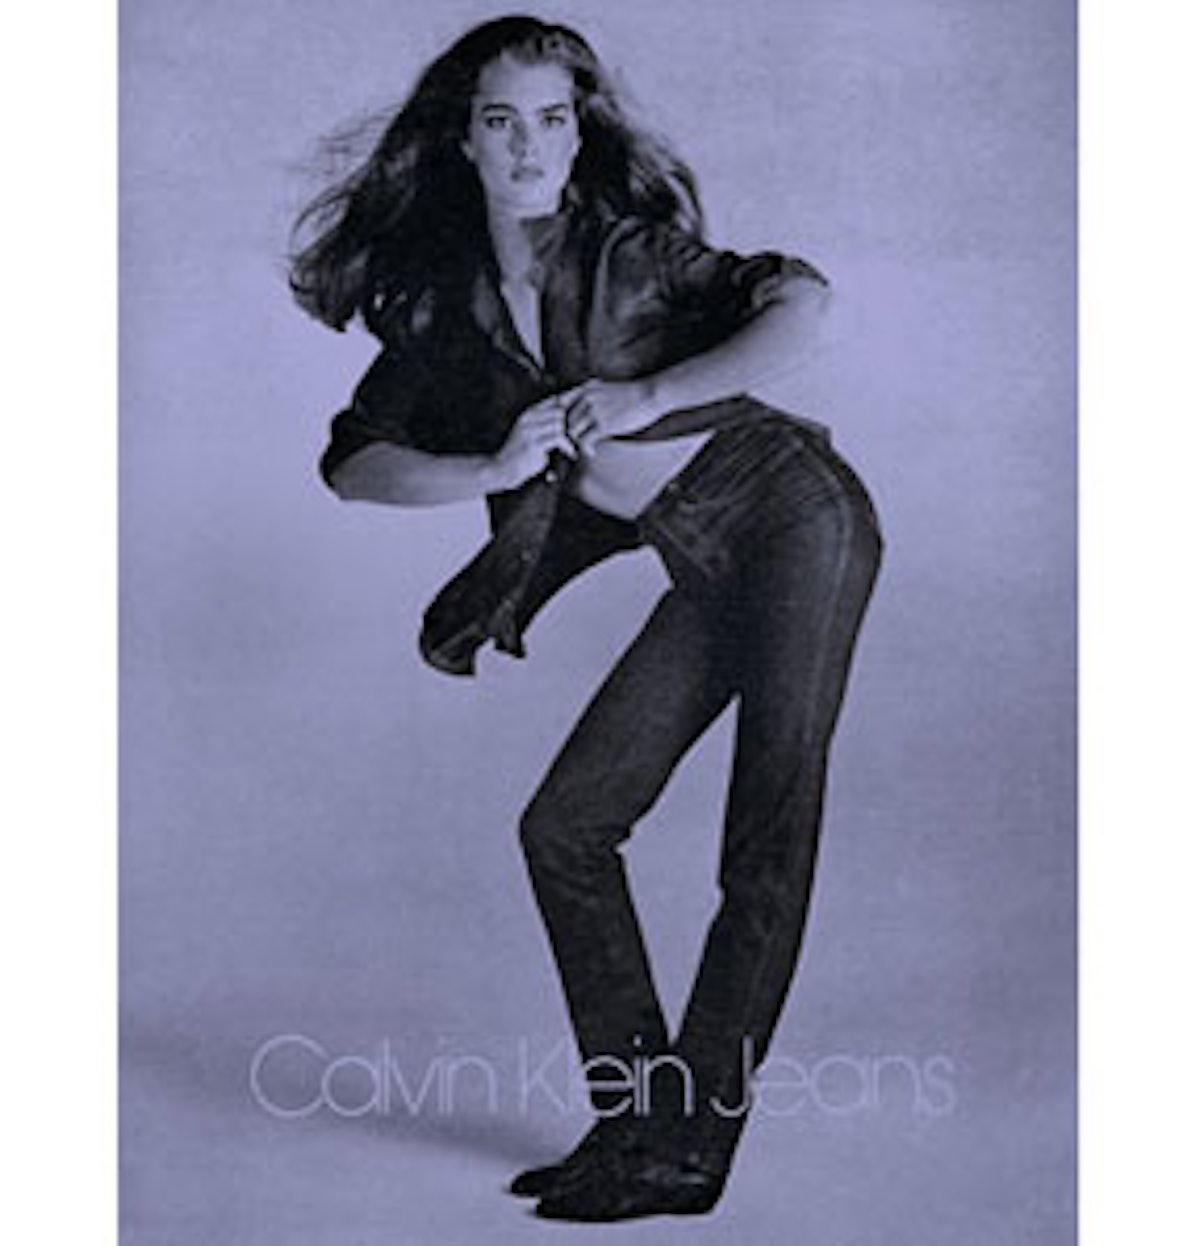 faar-fashion-scandals-40-years-04.jpg